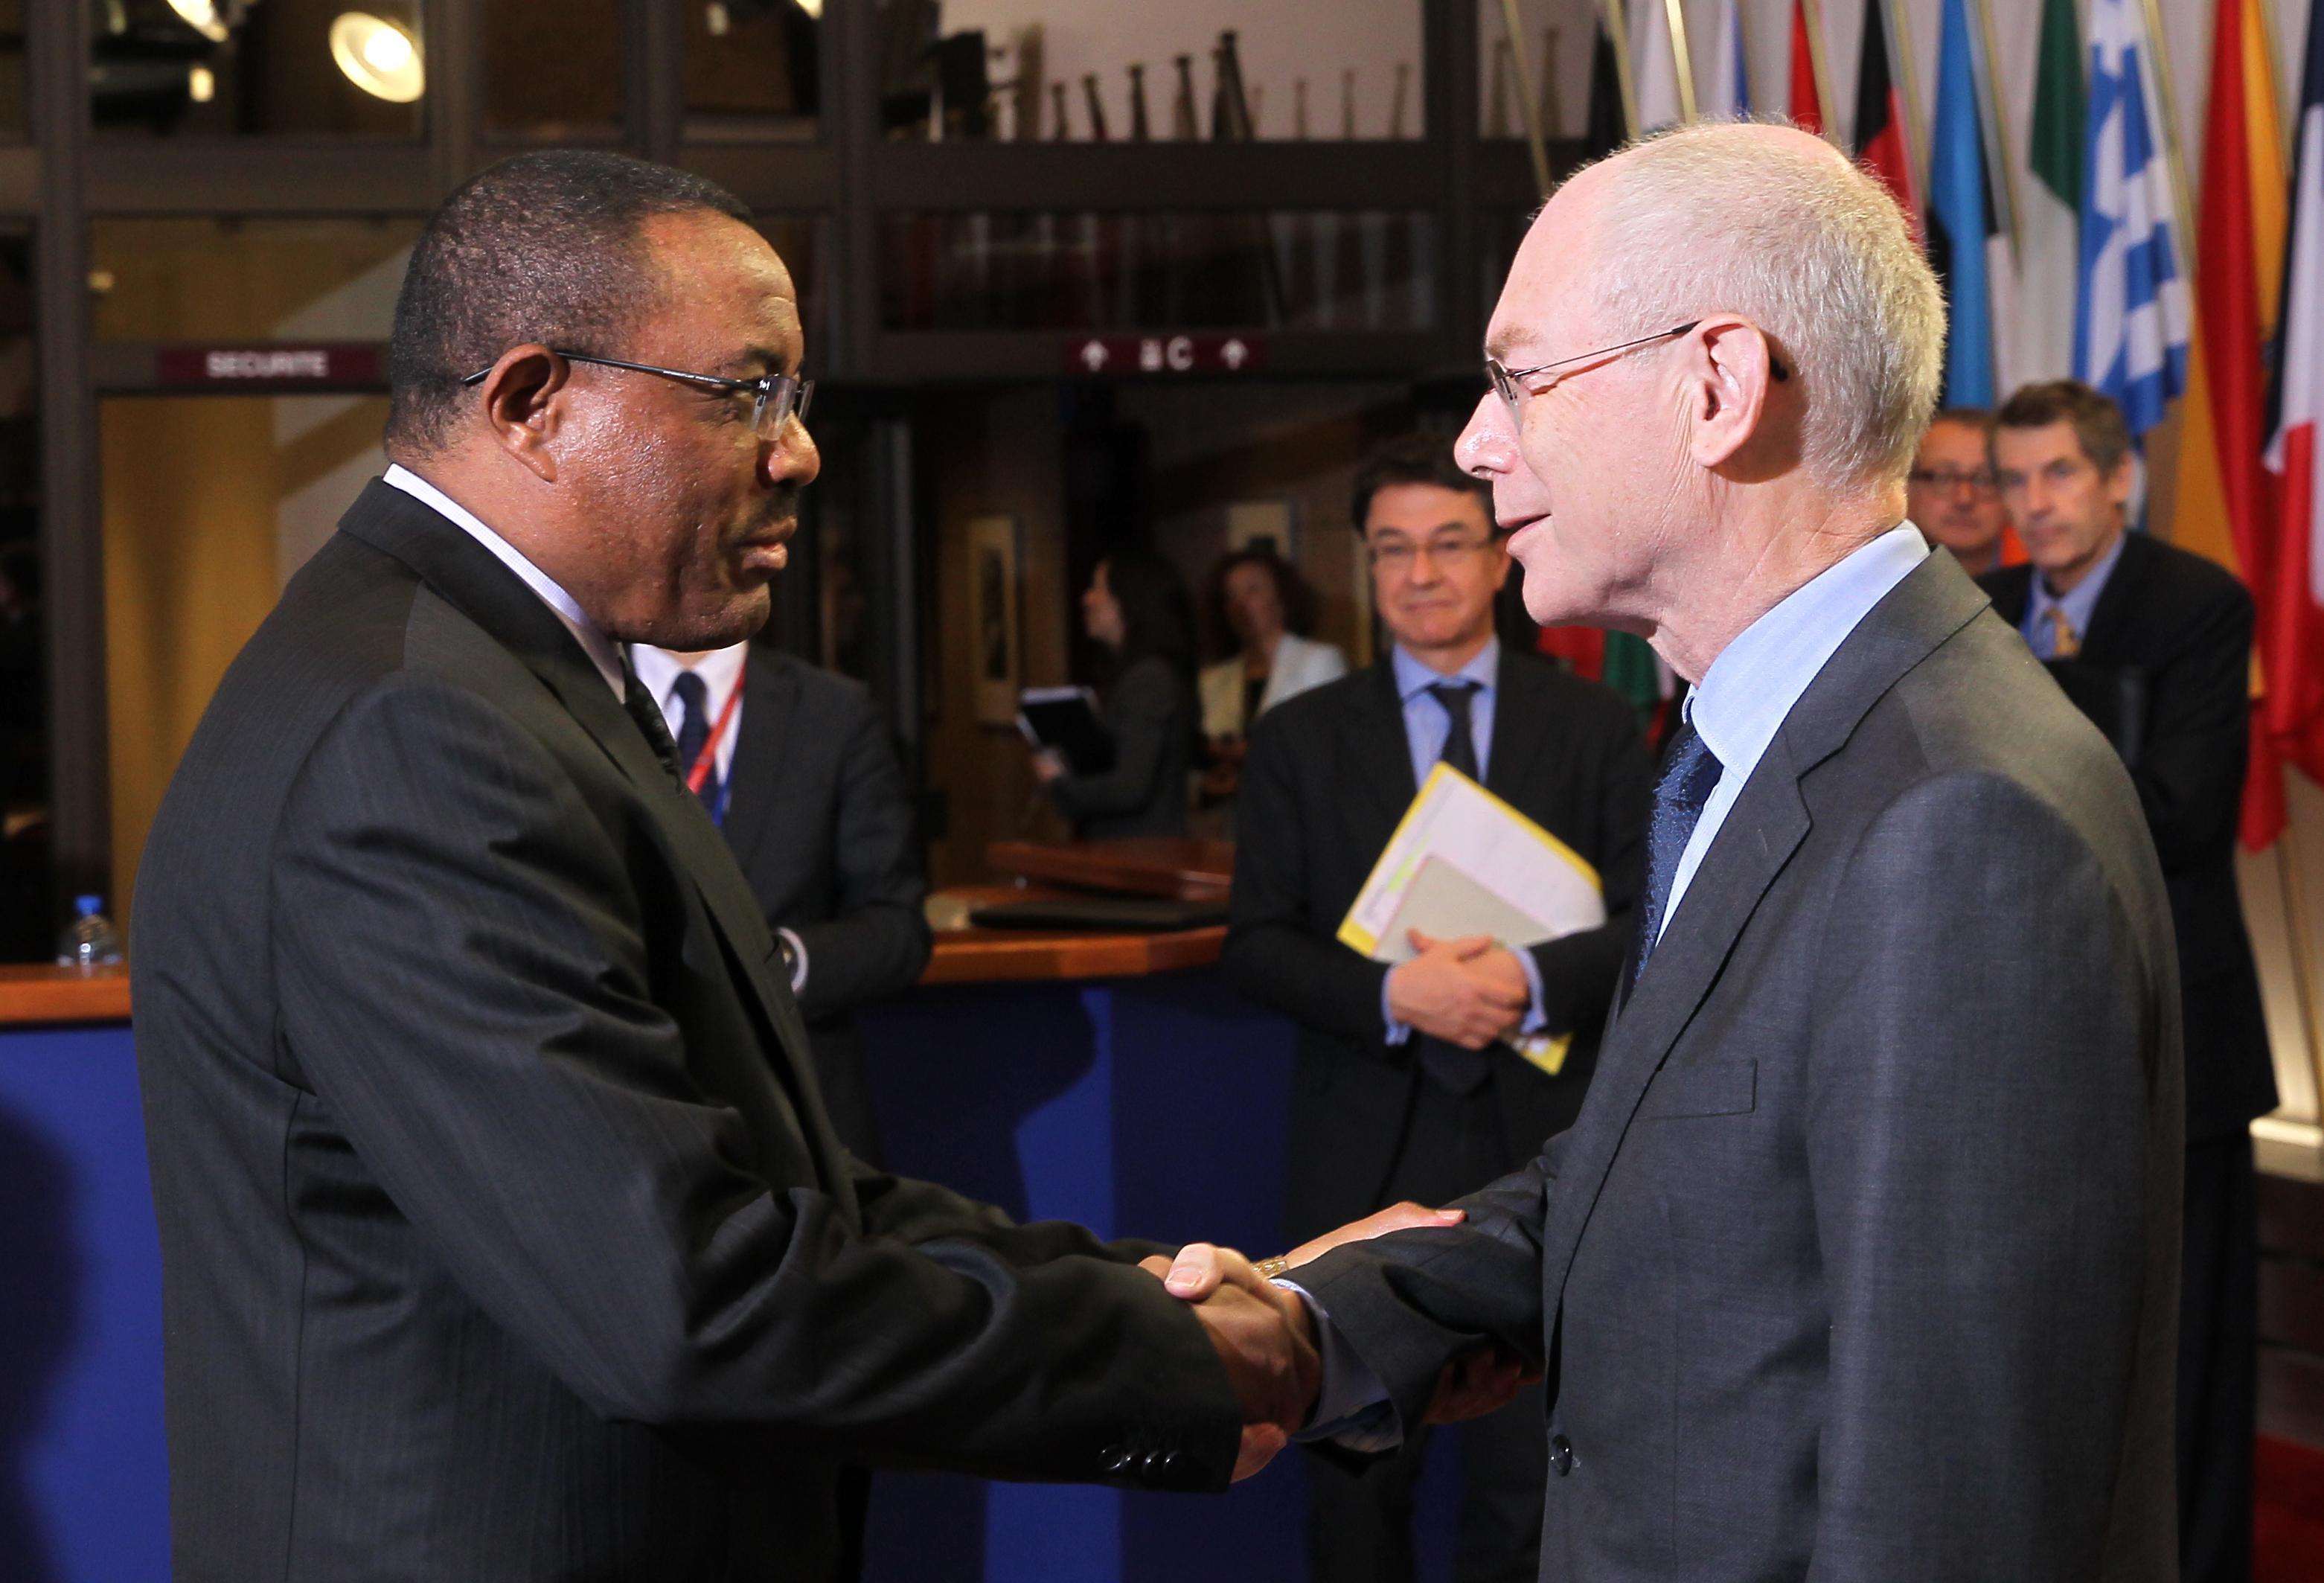 Prime Minister Hailemariam Desalegne and EU Council President Herman Van Rompuy